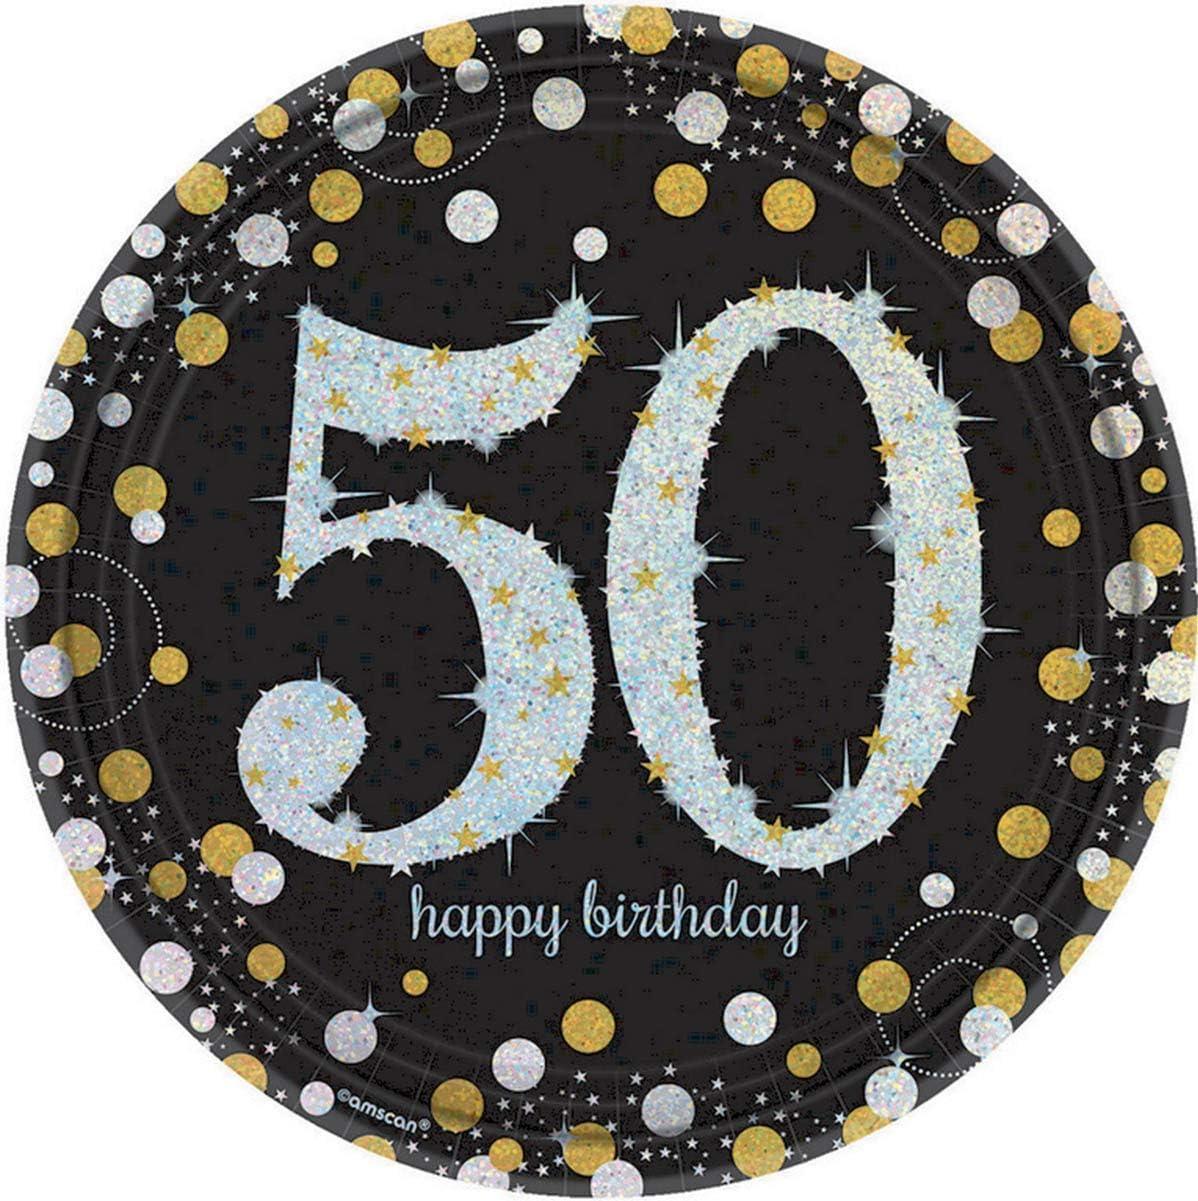 23cm Amscan Pack of 8 50 Sparkling Celebrations Gold Prismatic Round Paper